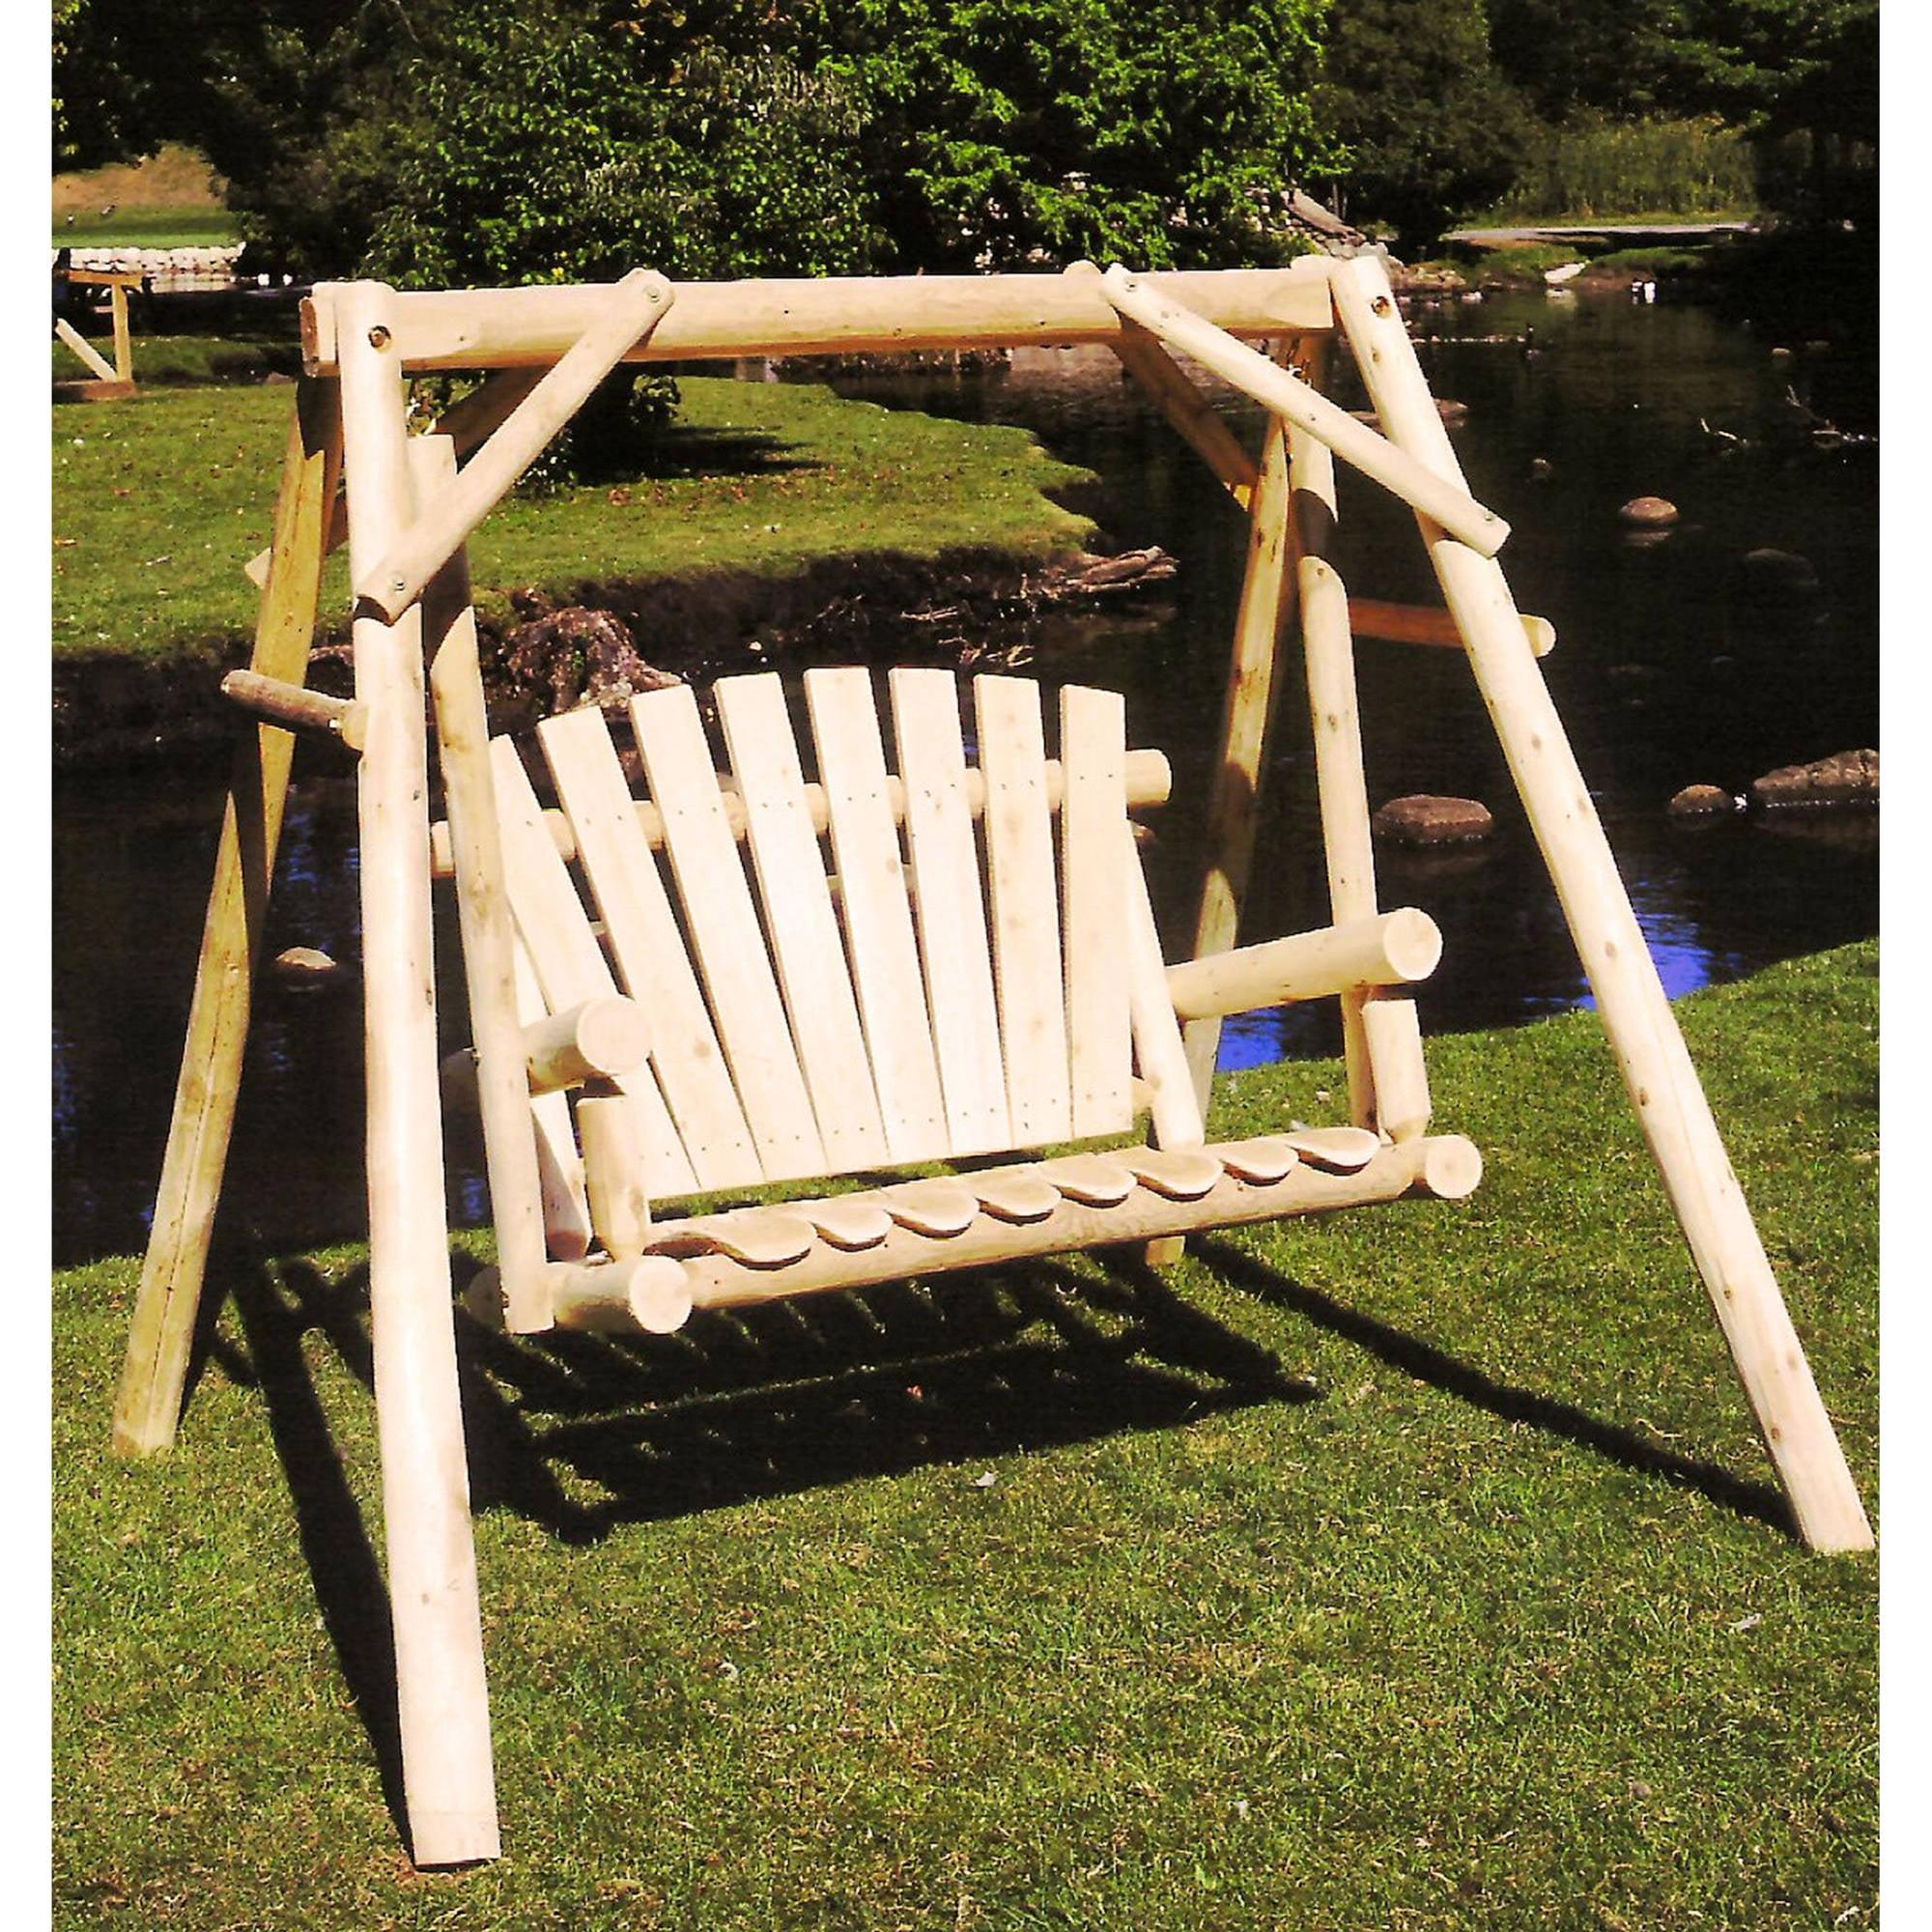 Lakeland Mills White Cedar Log Porch Swing and Stand Set by Lakeland Mills